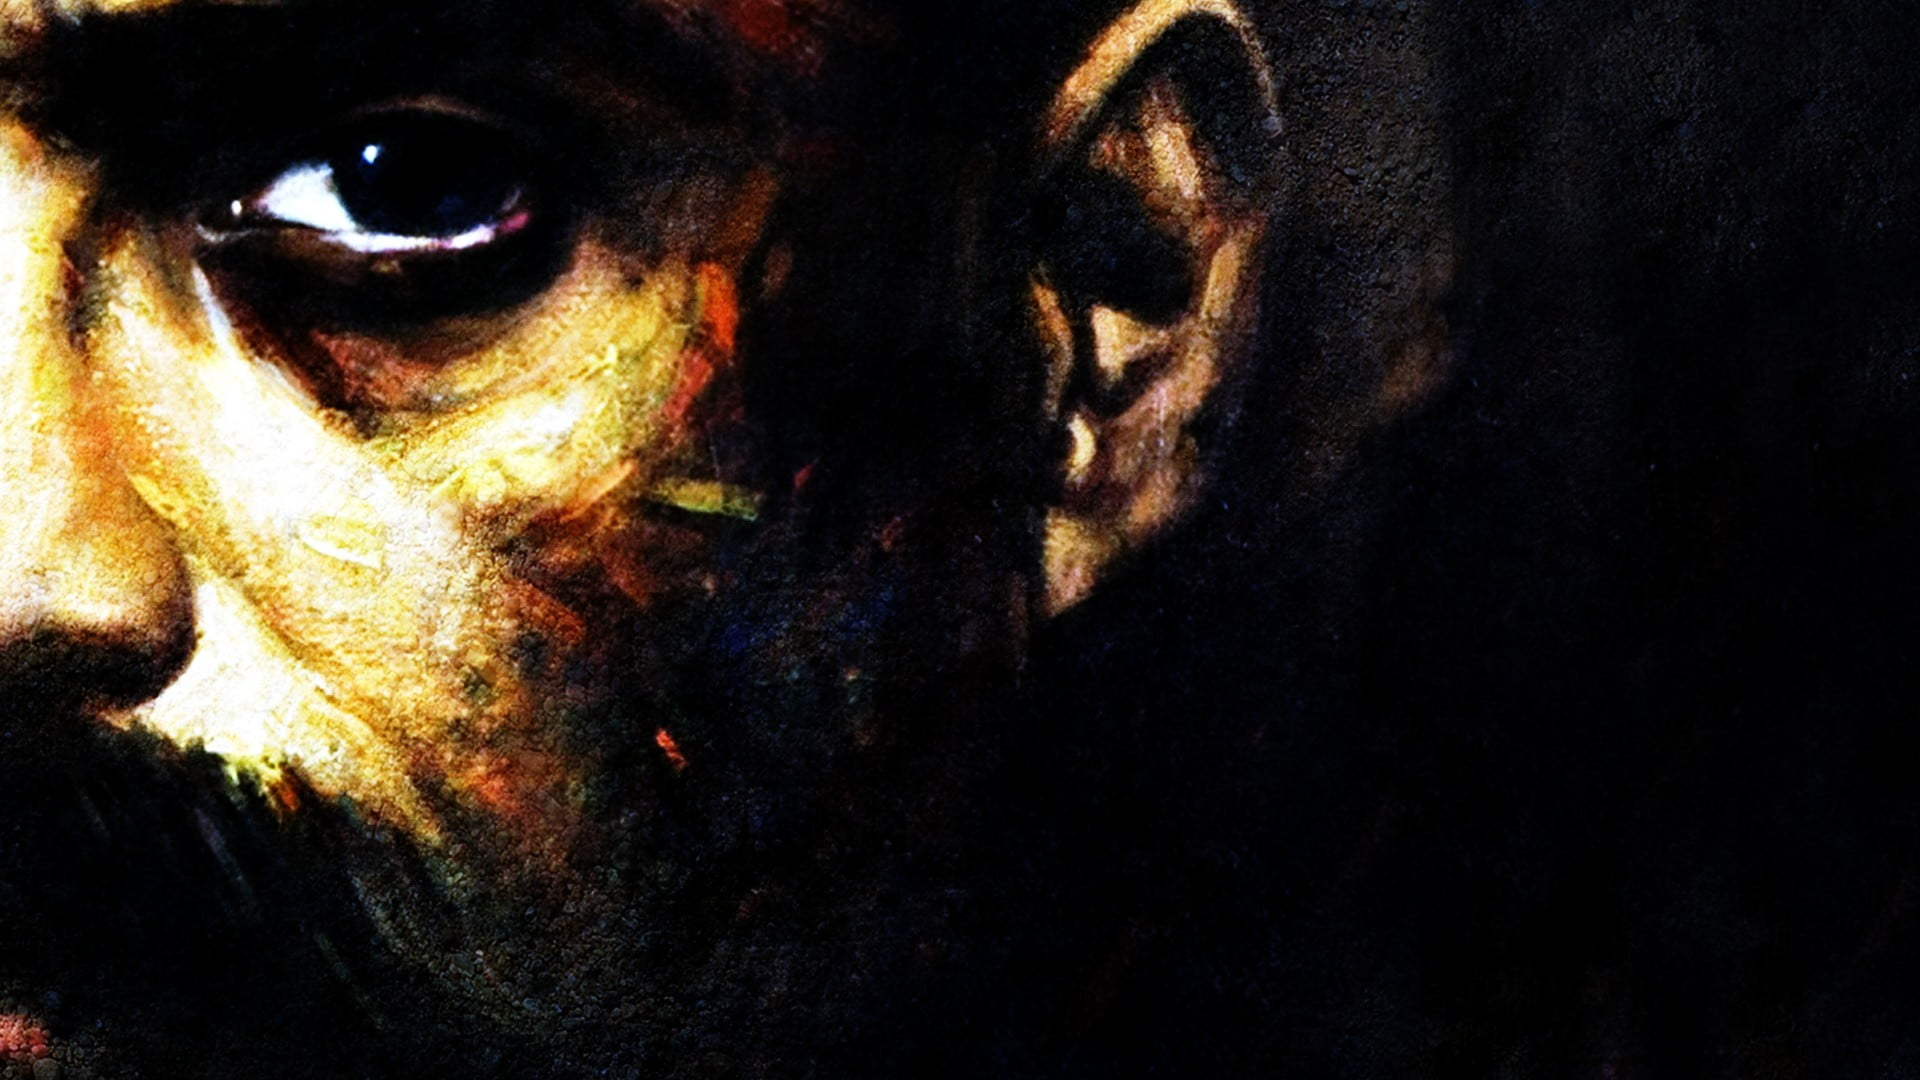 Man portrait celebrity Emiliano Zapata painting artwork HD 1920x1080